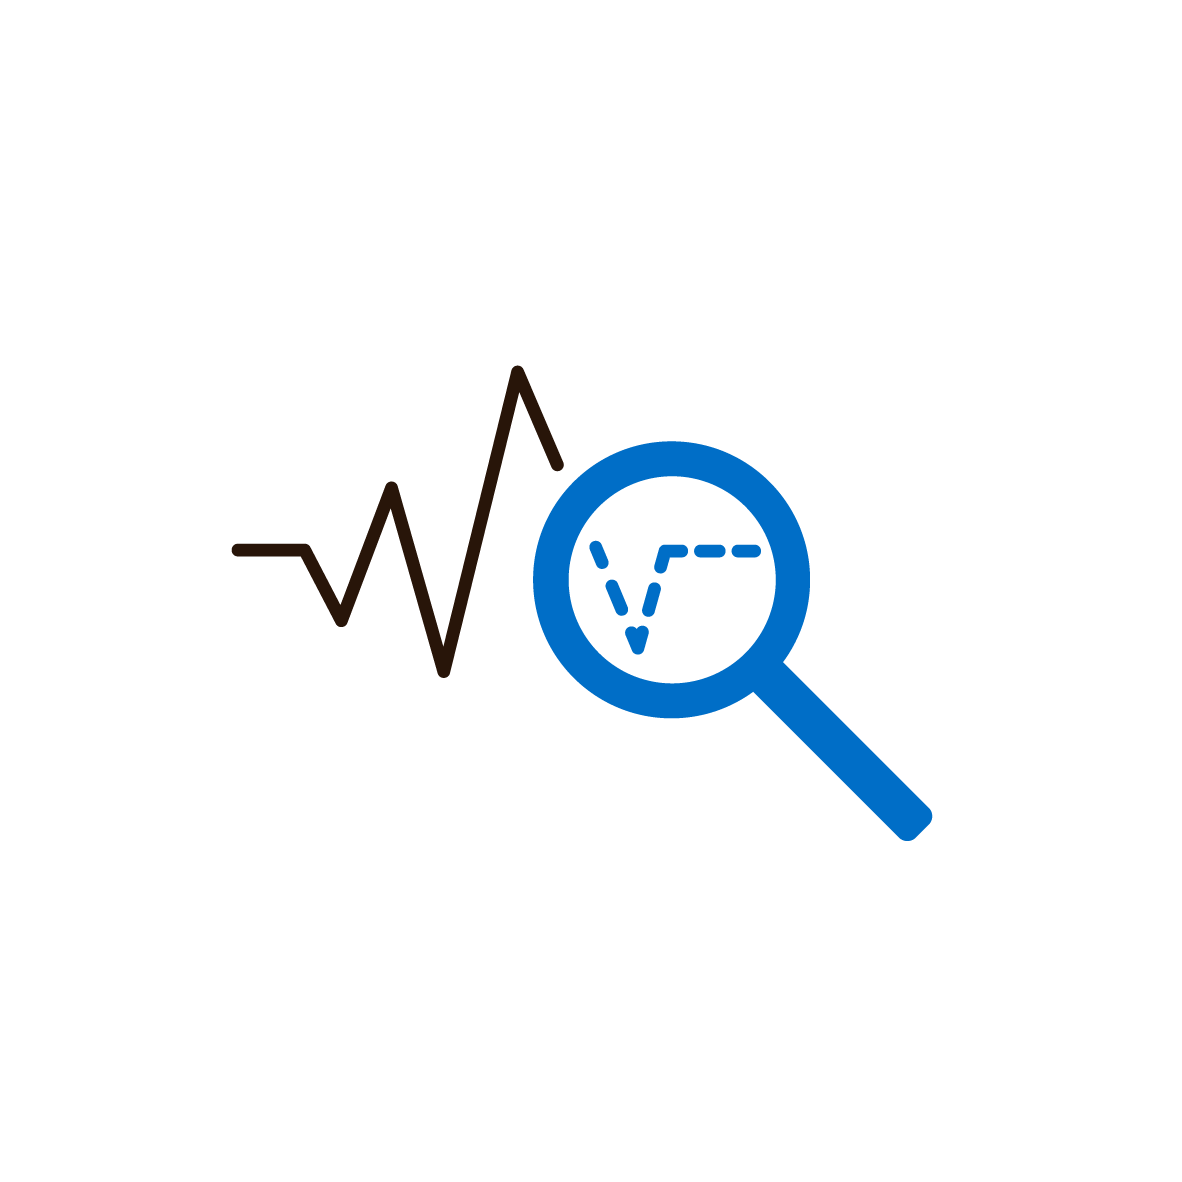 Icon Forschungsprojekte